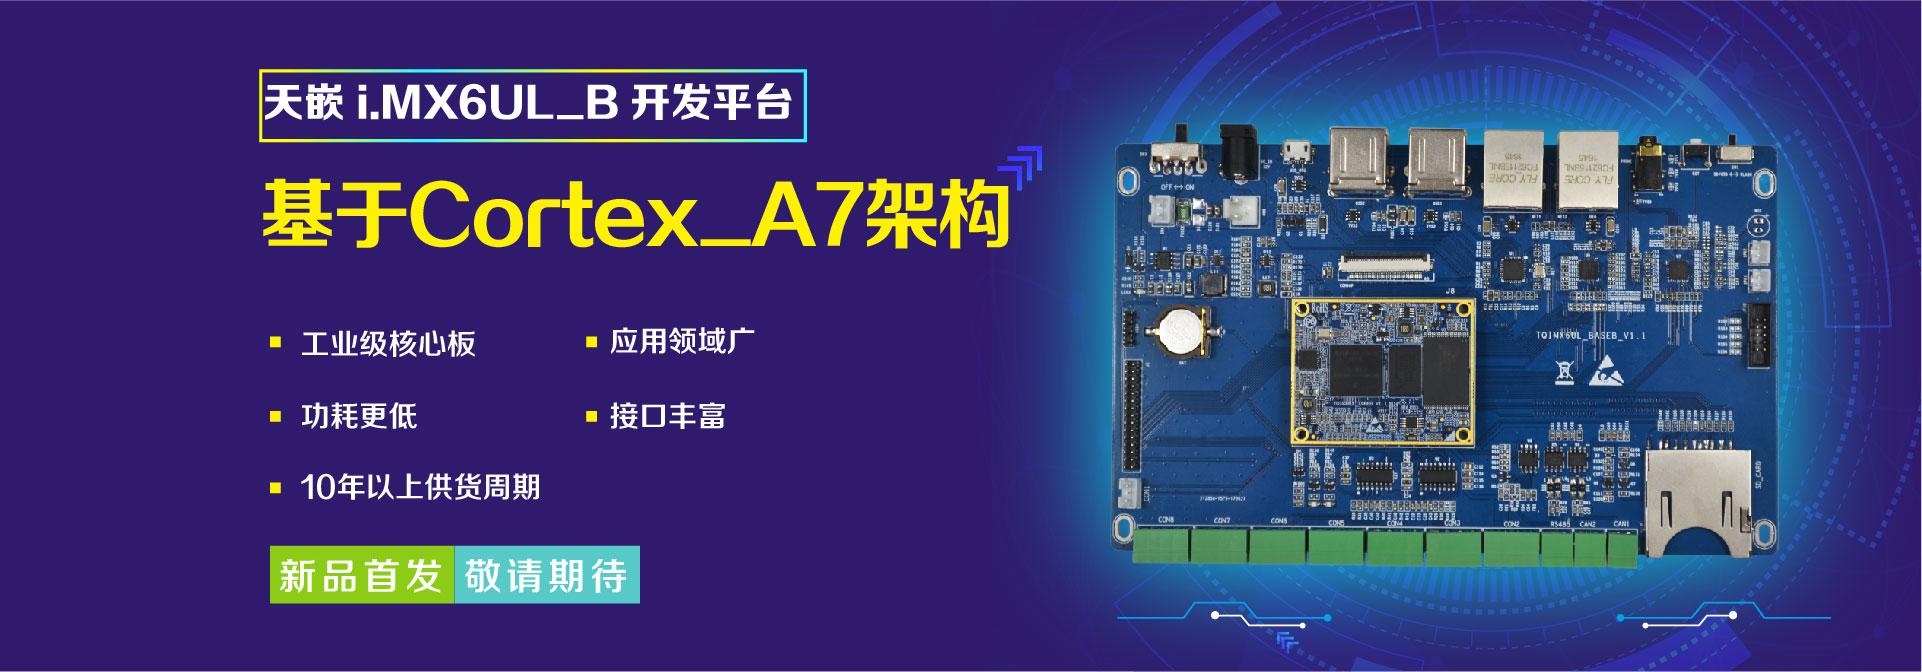 TQi.MX6UL工业级开发板平台Cortex-A7